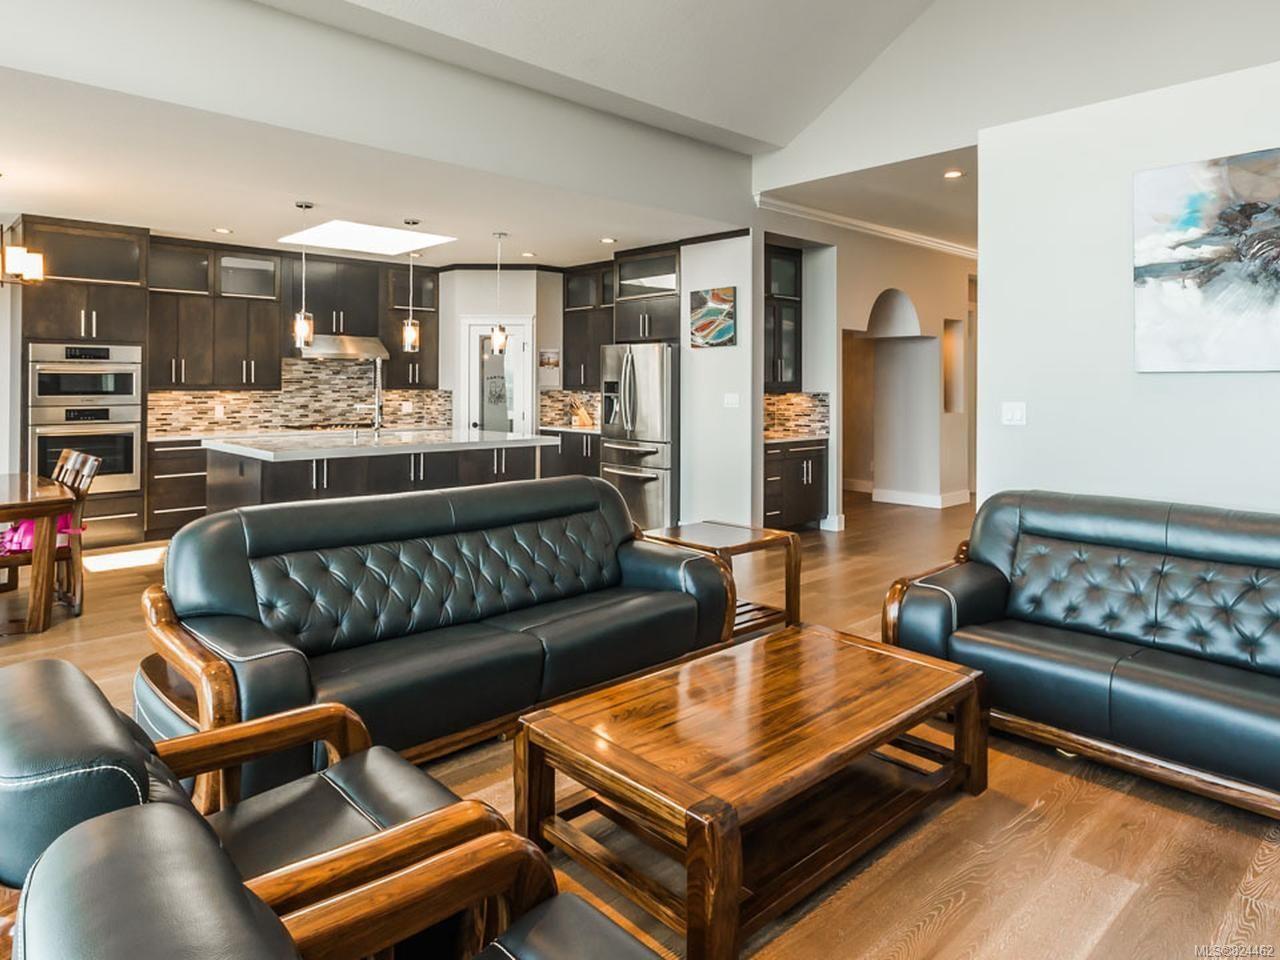 Photo 10: Photos: 3864 Gulfview Dr in NANAIMO: Na North Nanaimo House for sale (Nanaimo)  : MLS®# 824462